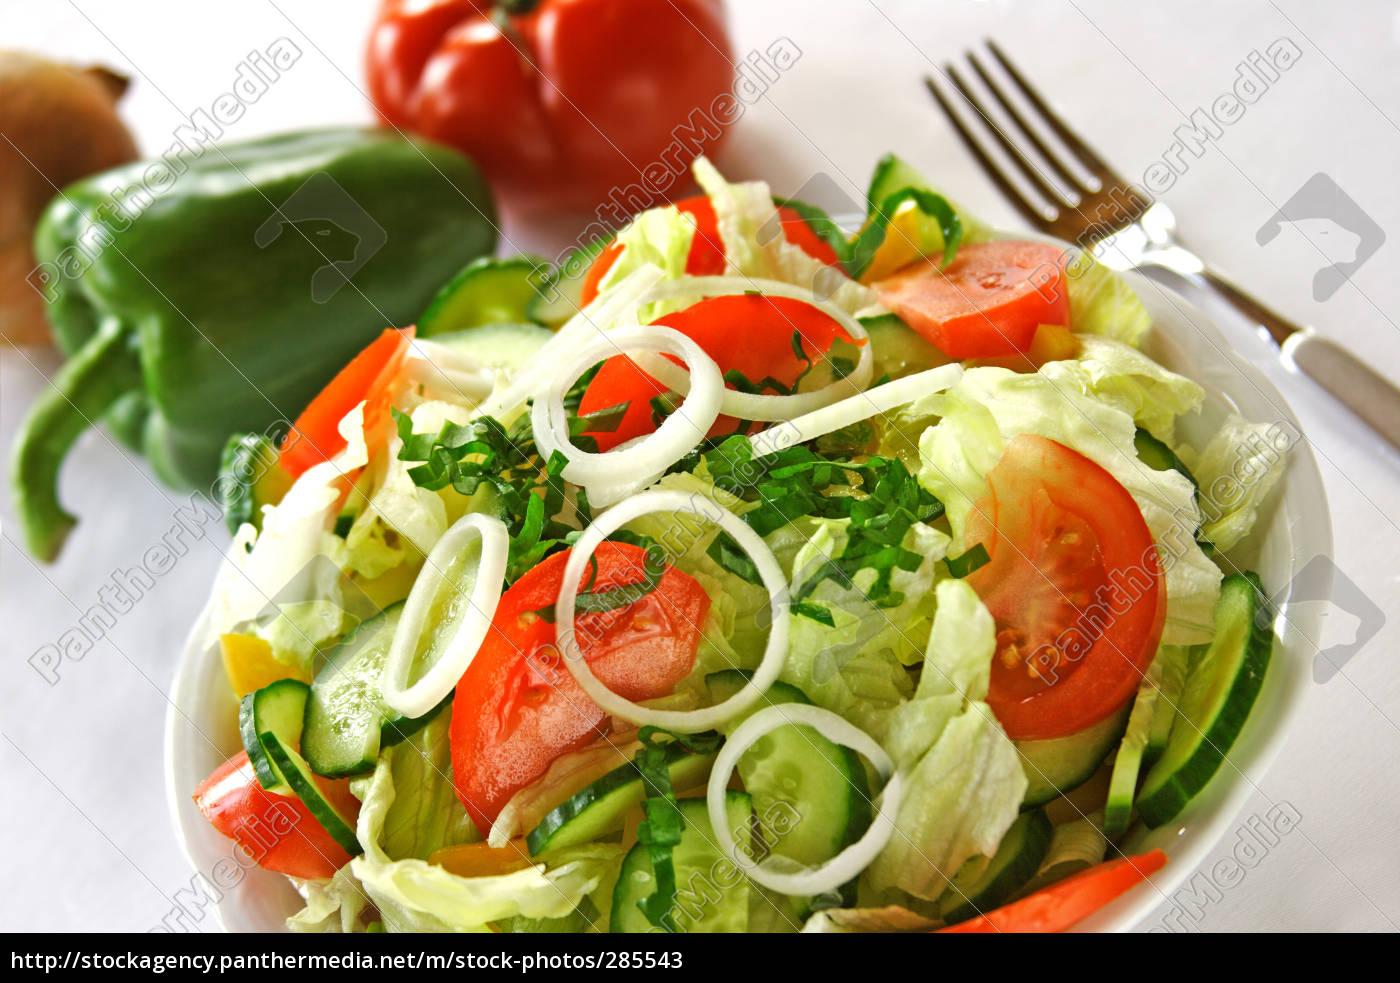 garden, salad, with, herbs - 285543